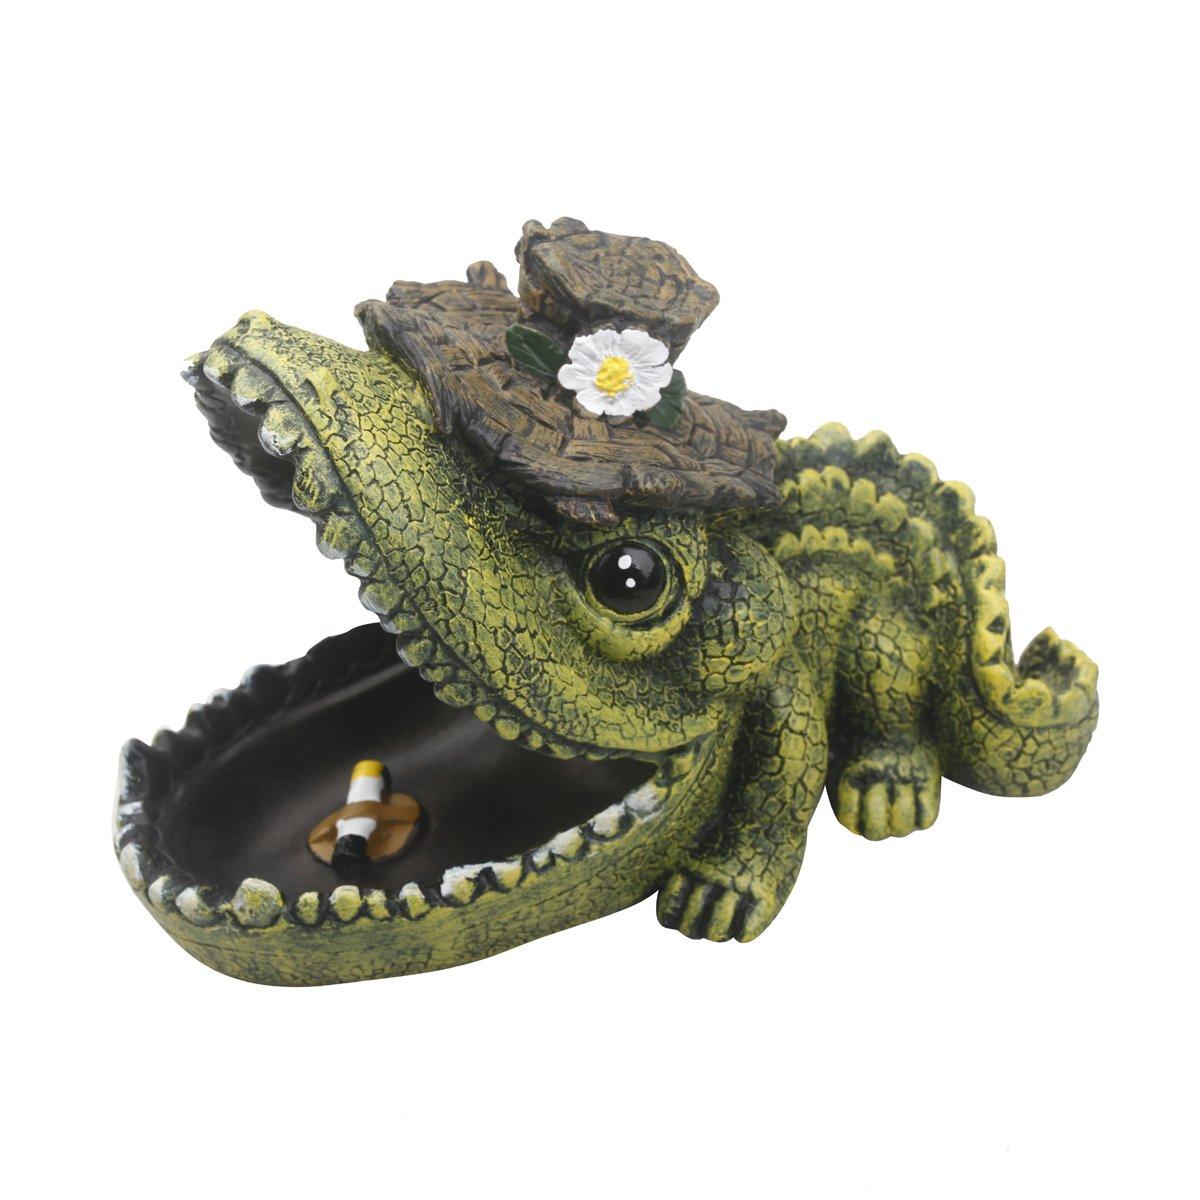 Scotte crocodile ashtray Resin ashtray Creative household Decoration ashtray